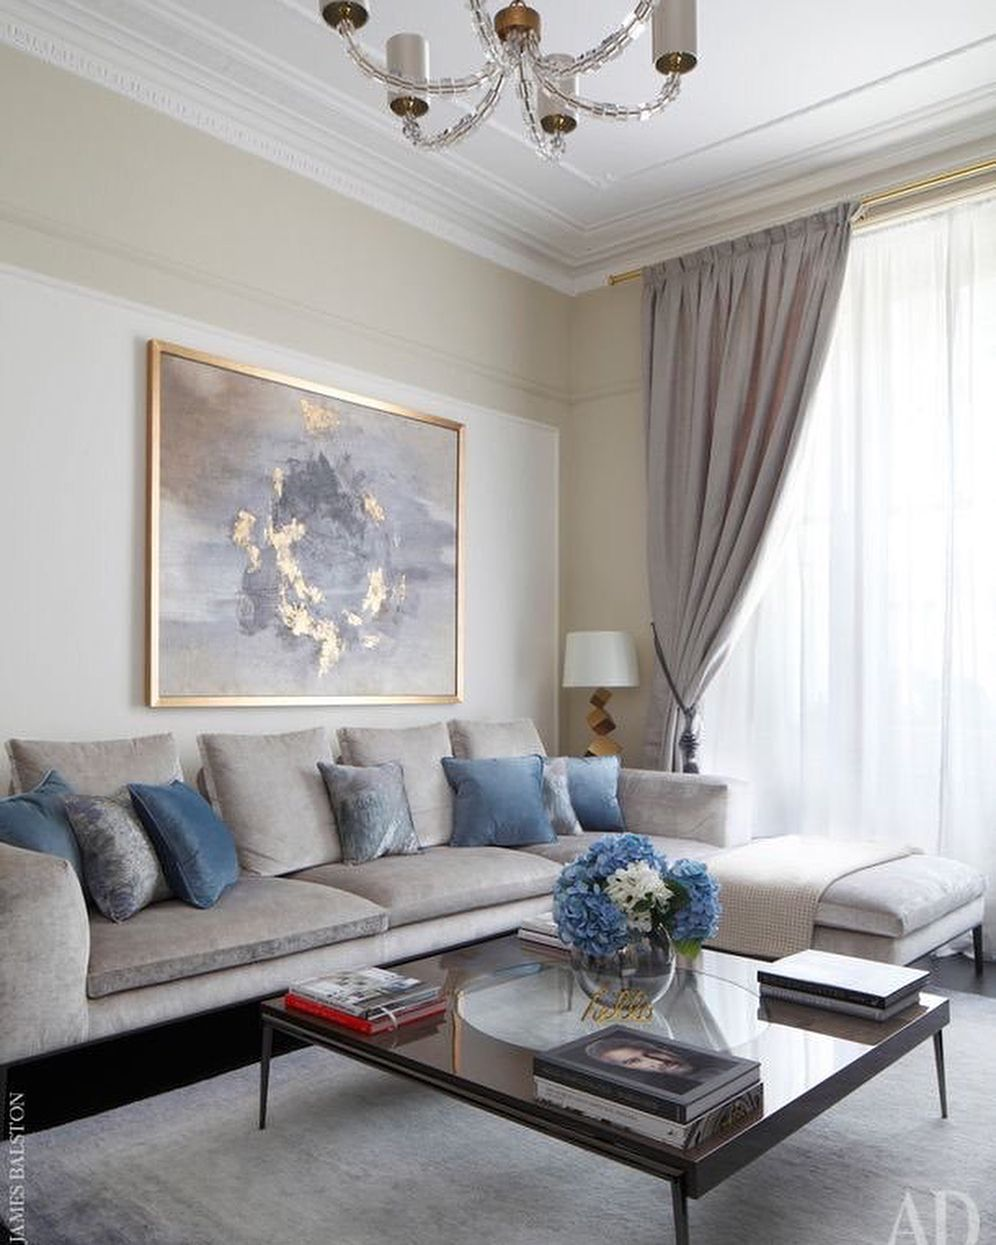 تصميم داخلي لشقة تصميم داخلي مودرن تصميم ديكور أثاث فلل مطبخ صالات غرفة نوم Modern Style Living Room Living Room Decor Apartment Luxury Living Room